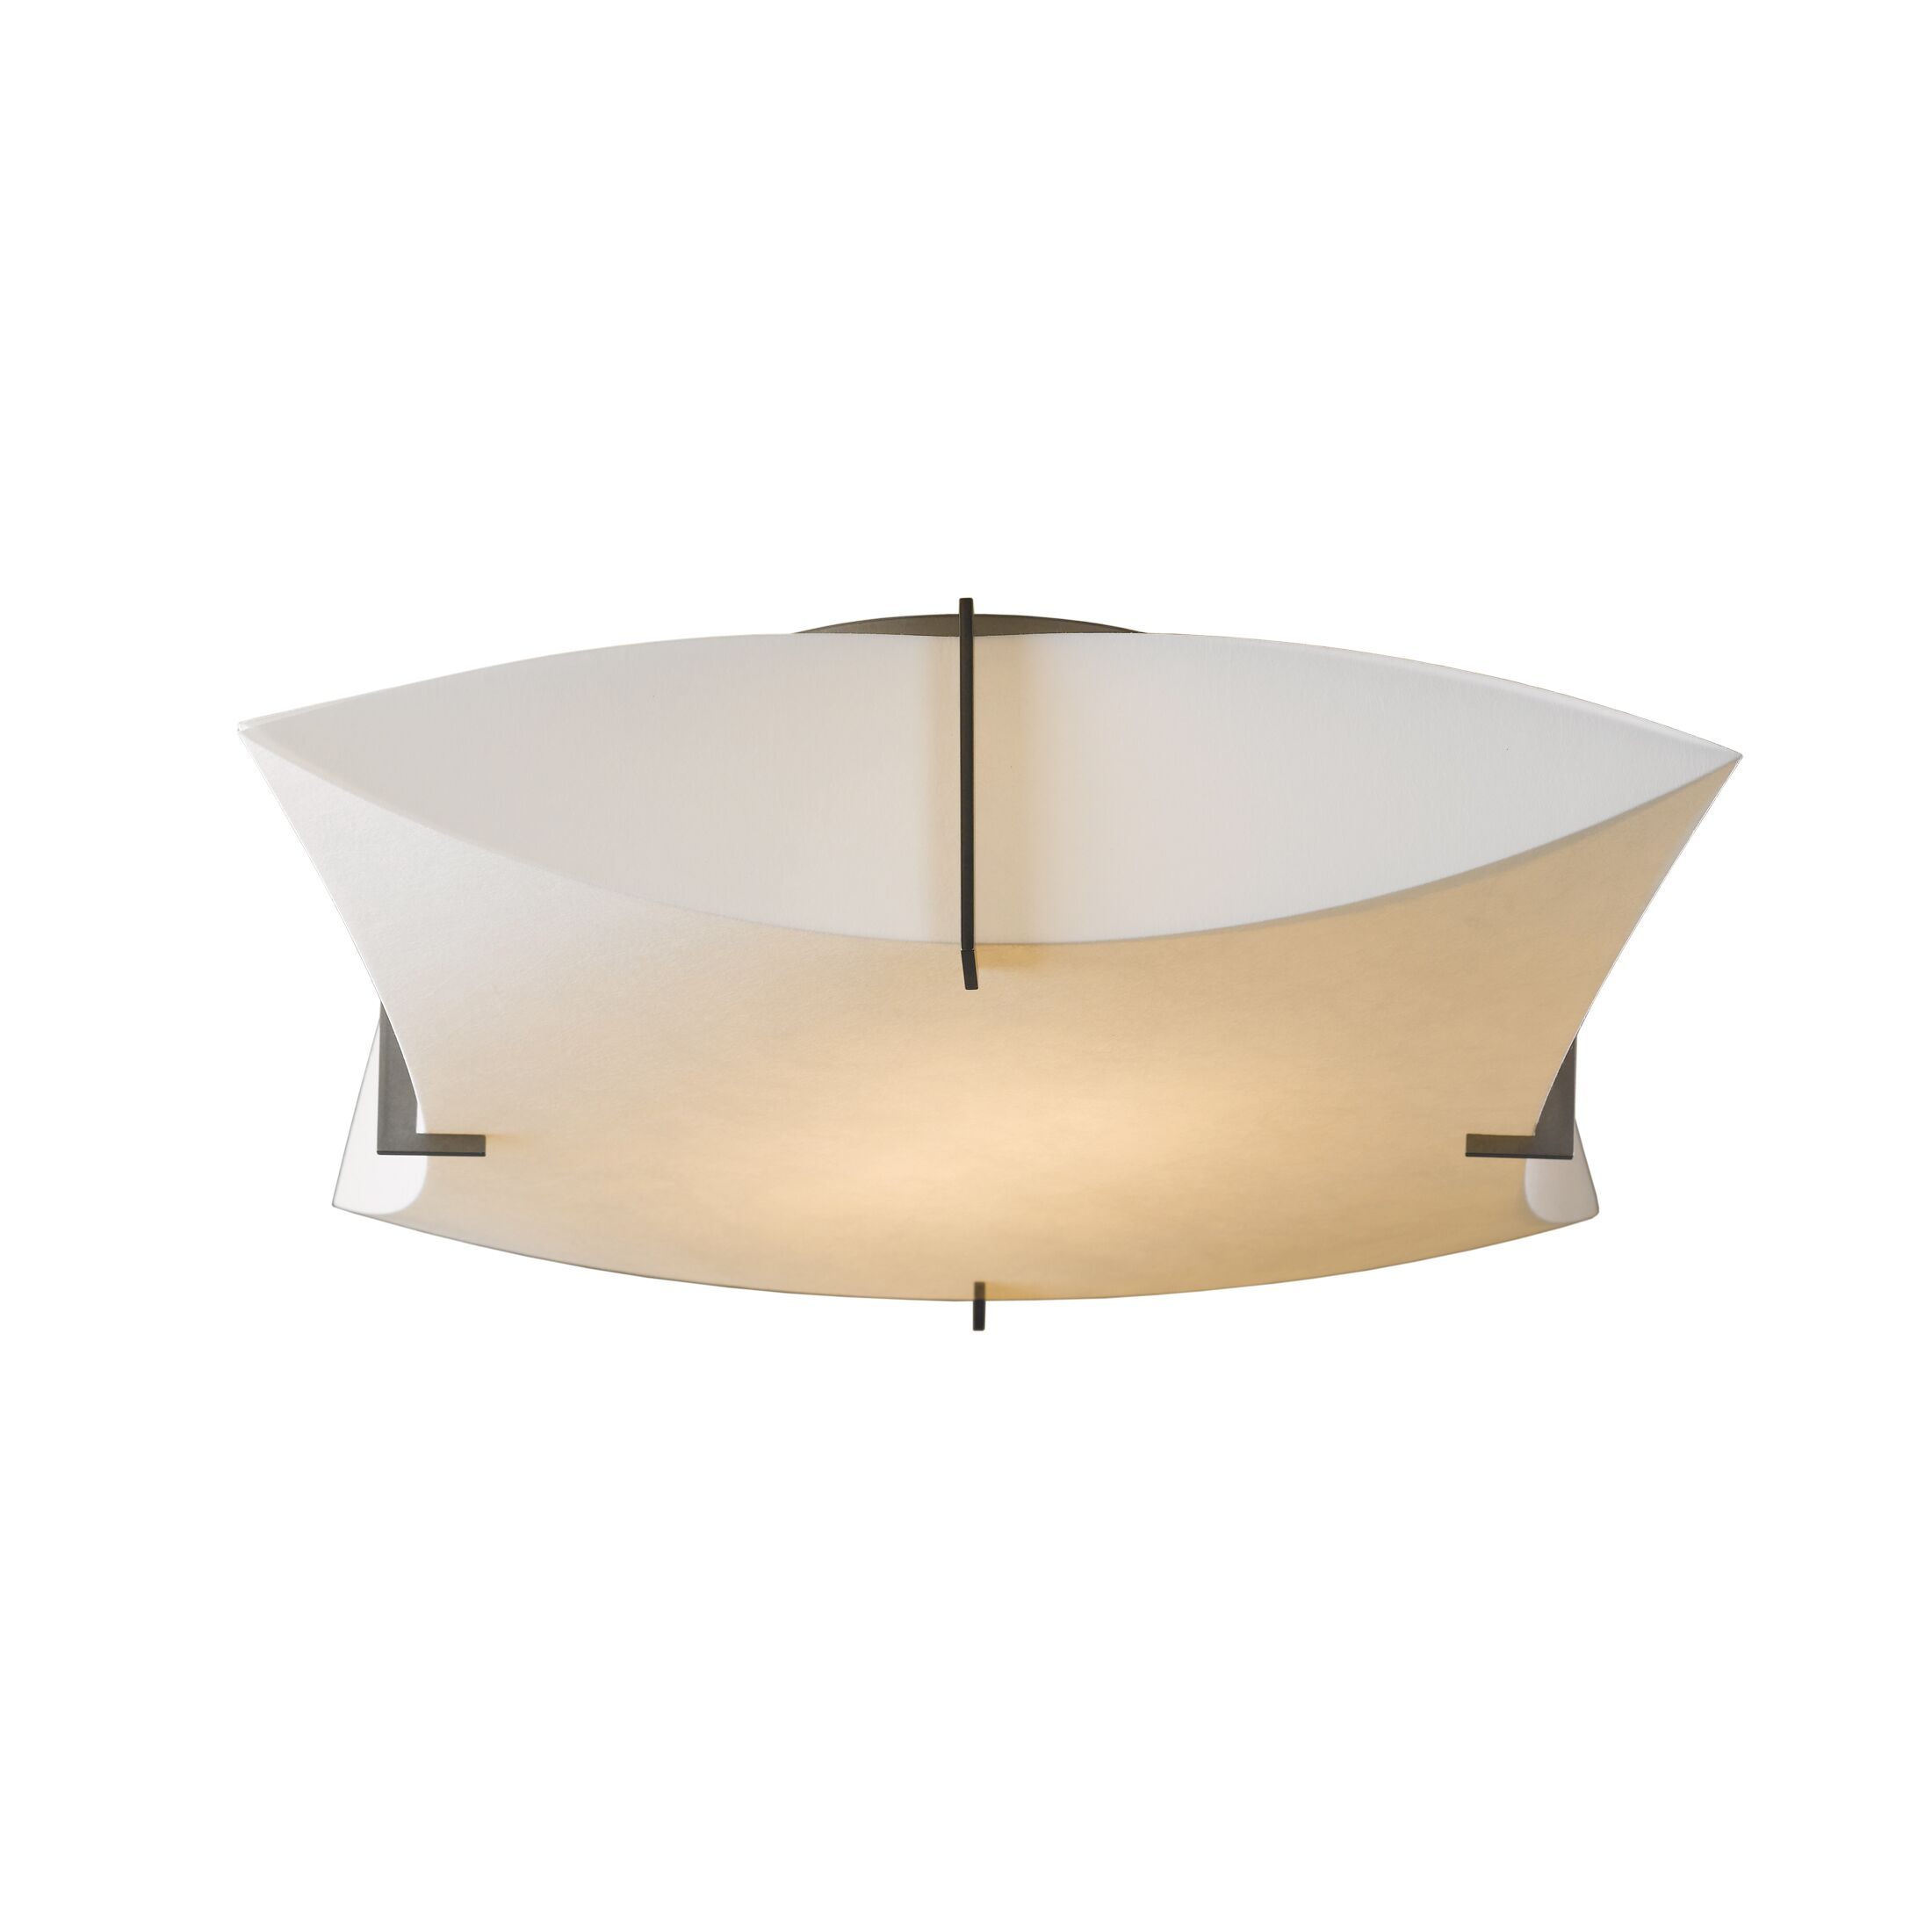 Bento 2-Light Semi Flush Mount Shade Color: Spun Amber, Finish: Translucent Bronze